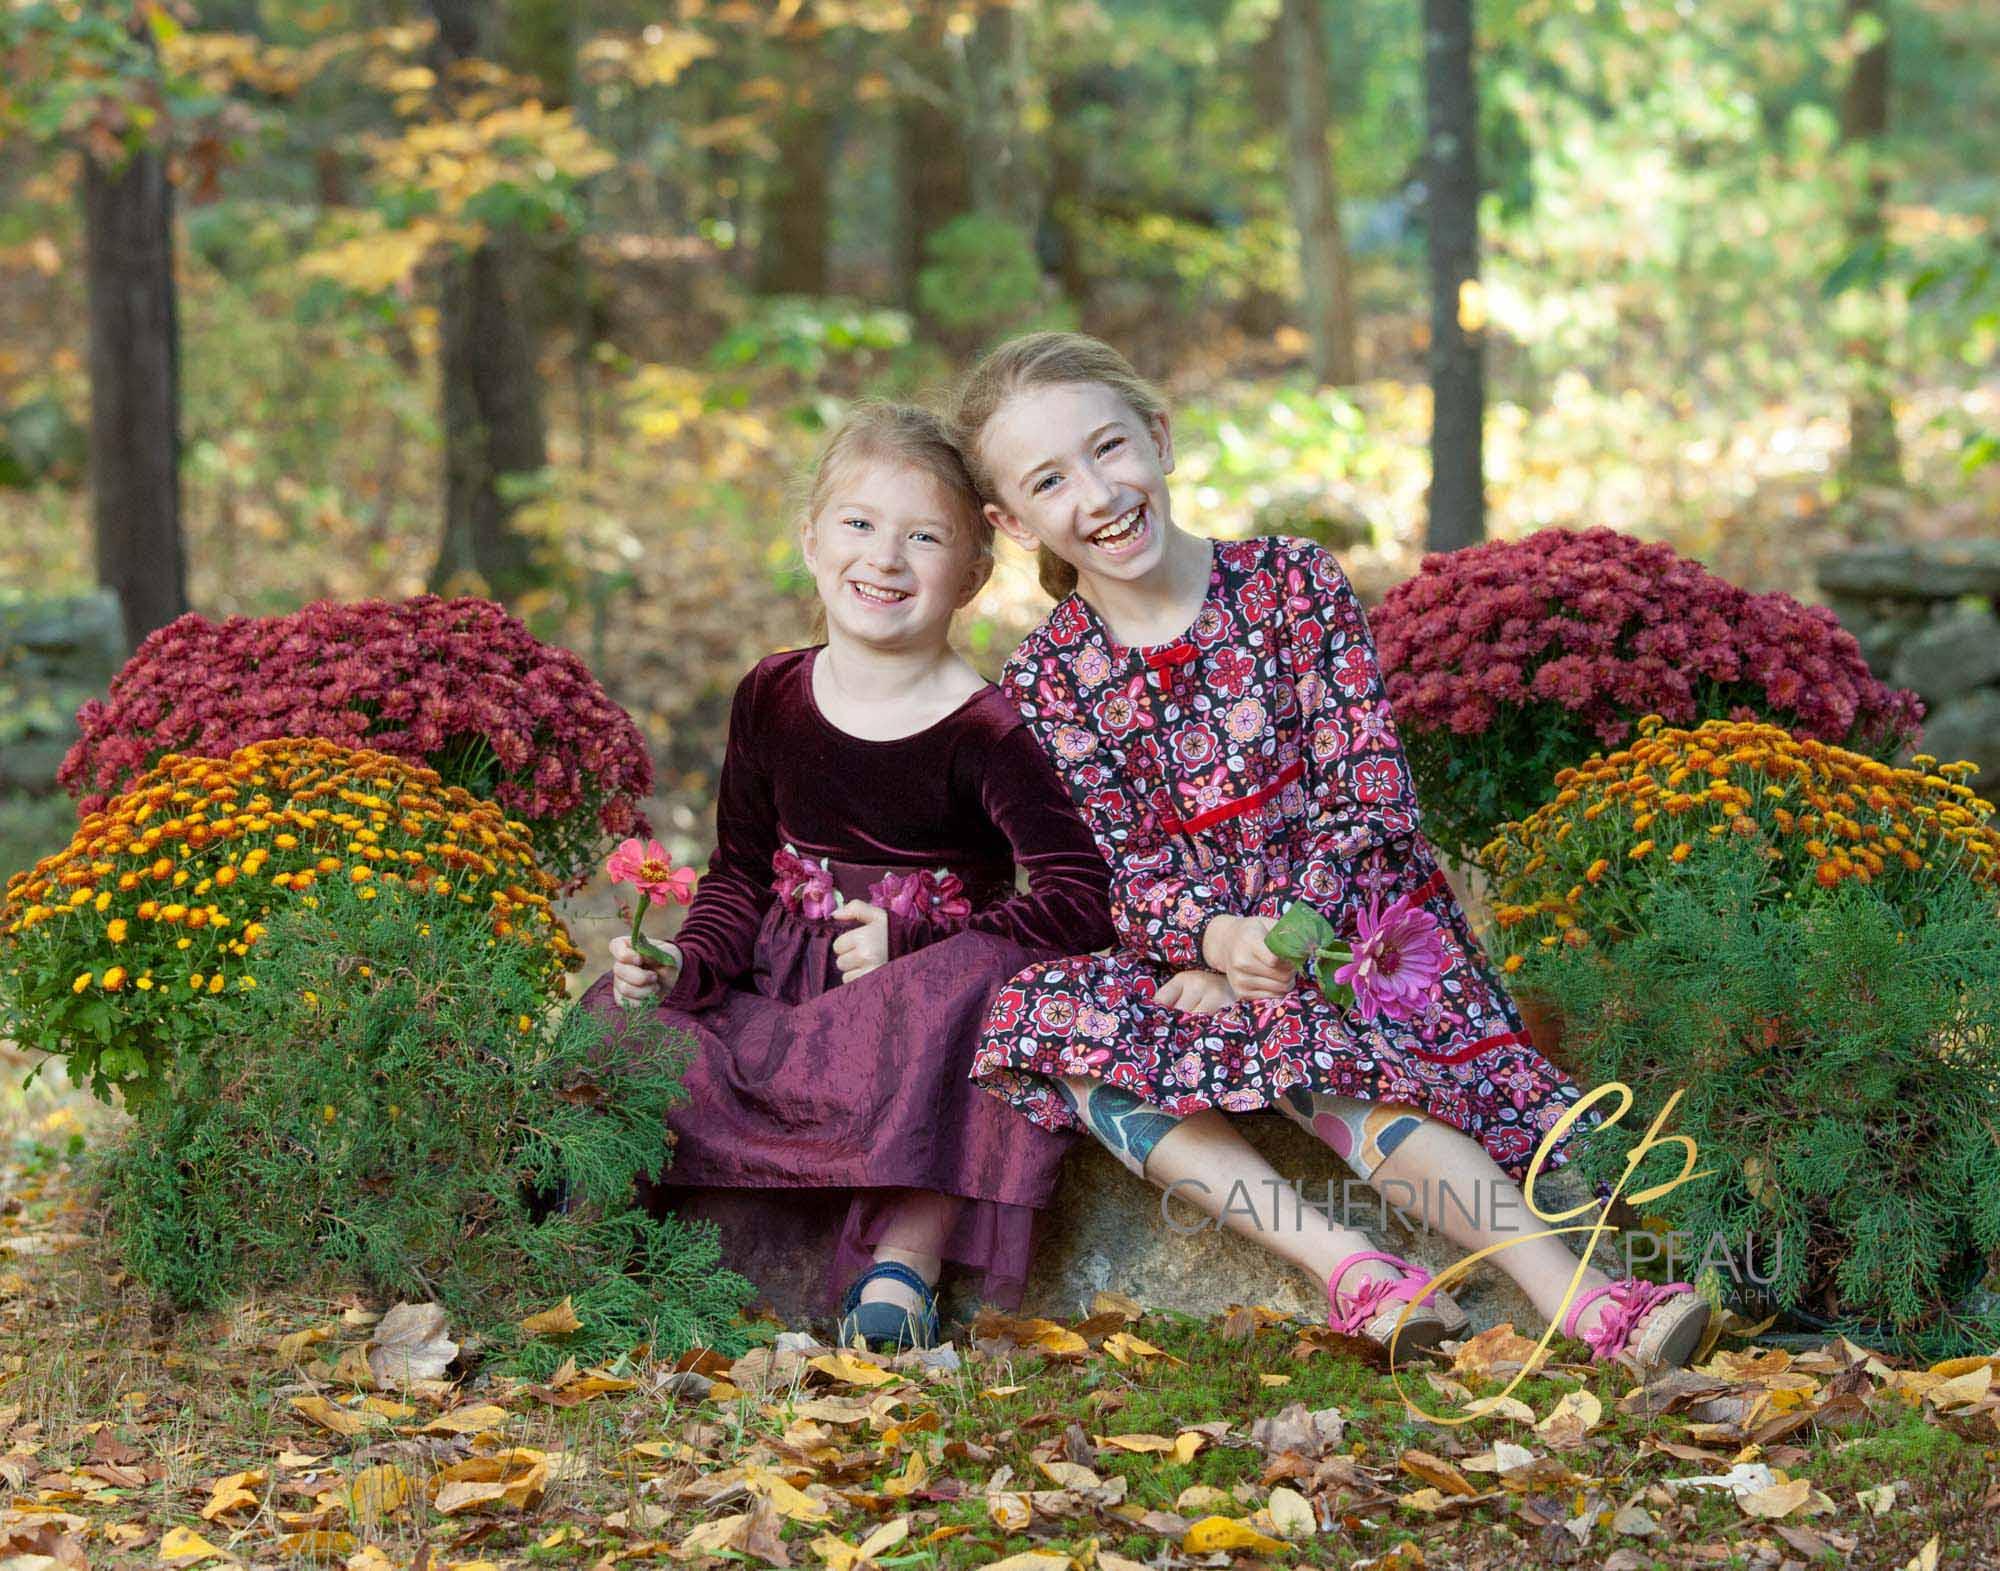 catherinepfauphotography_familyportrait_children_photography-12.jpg